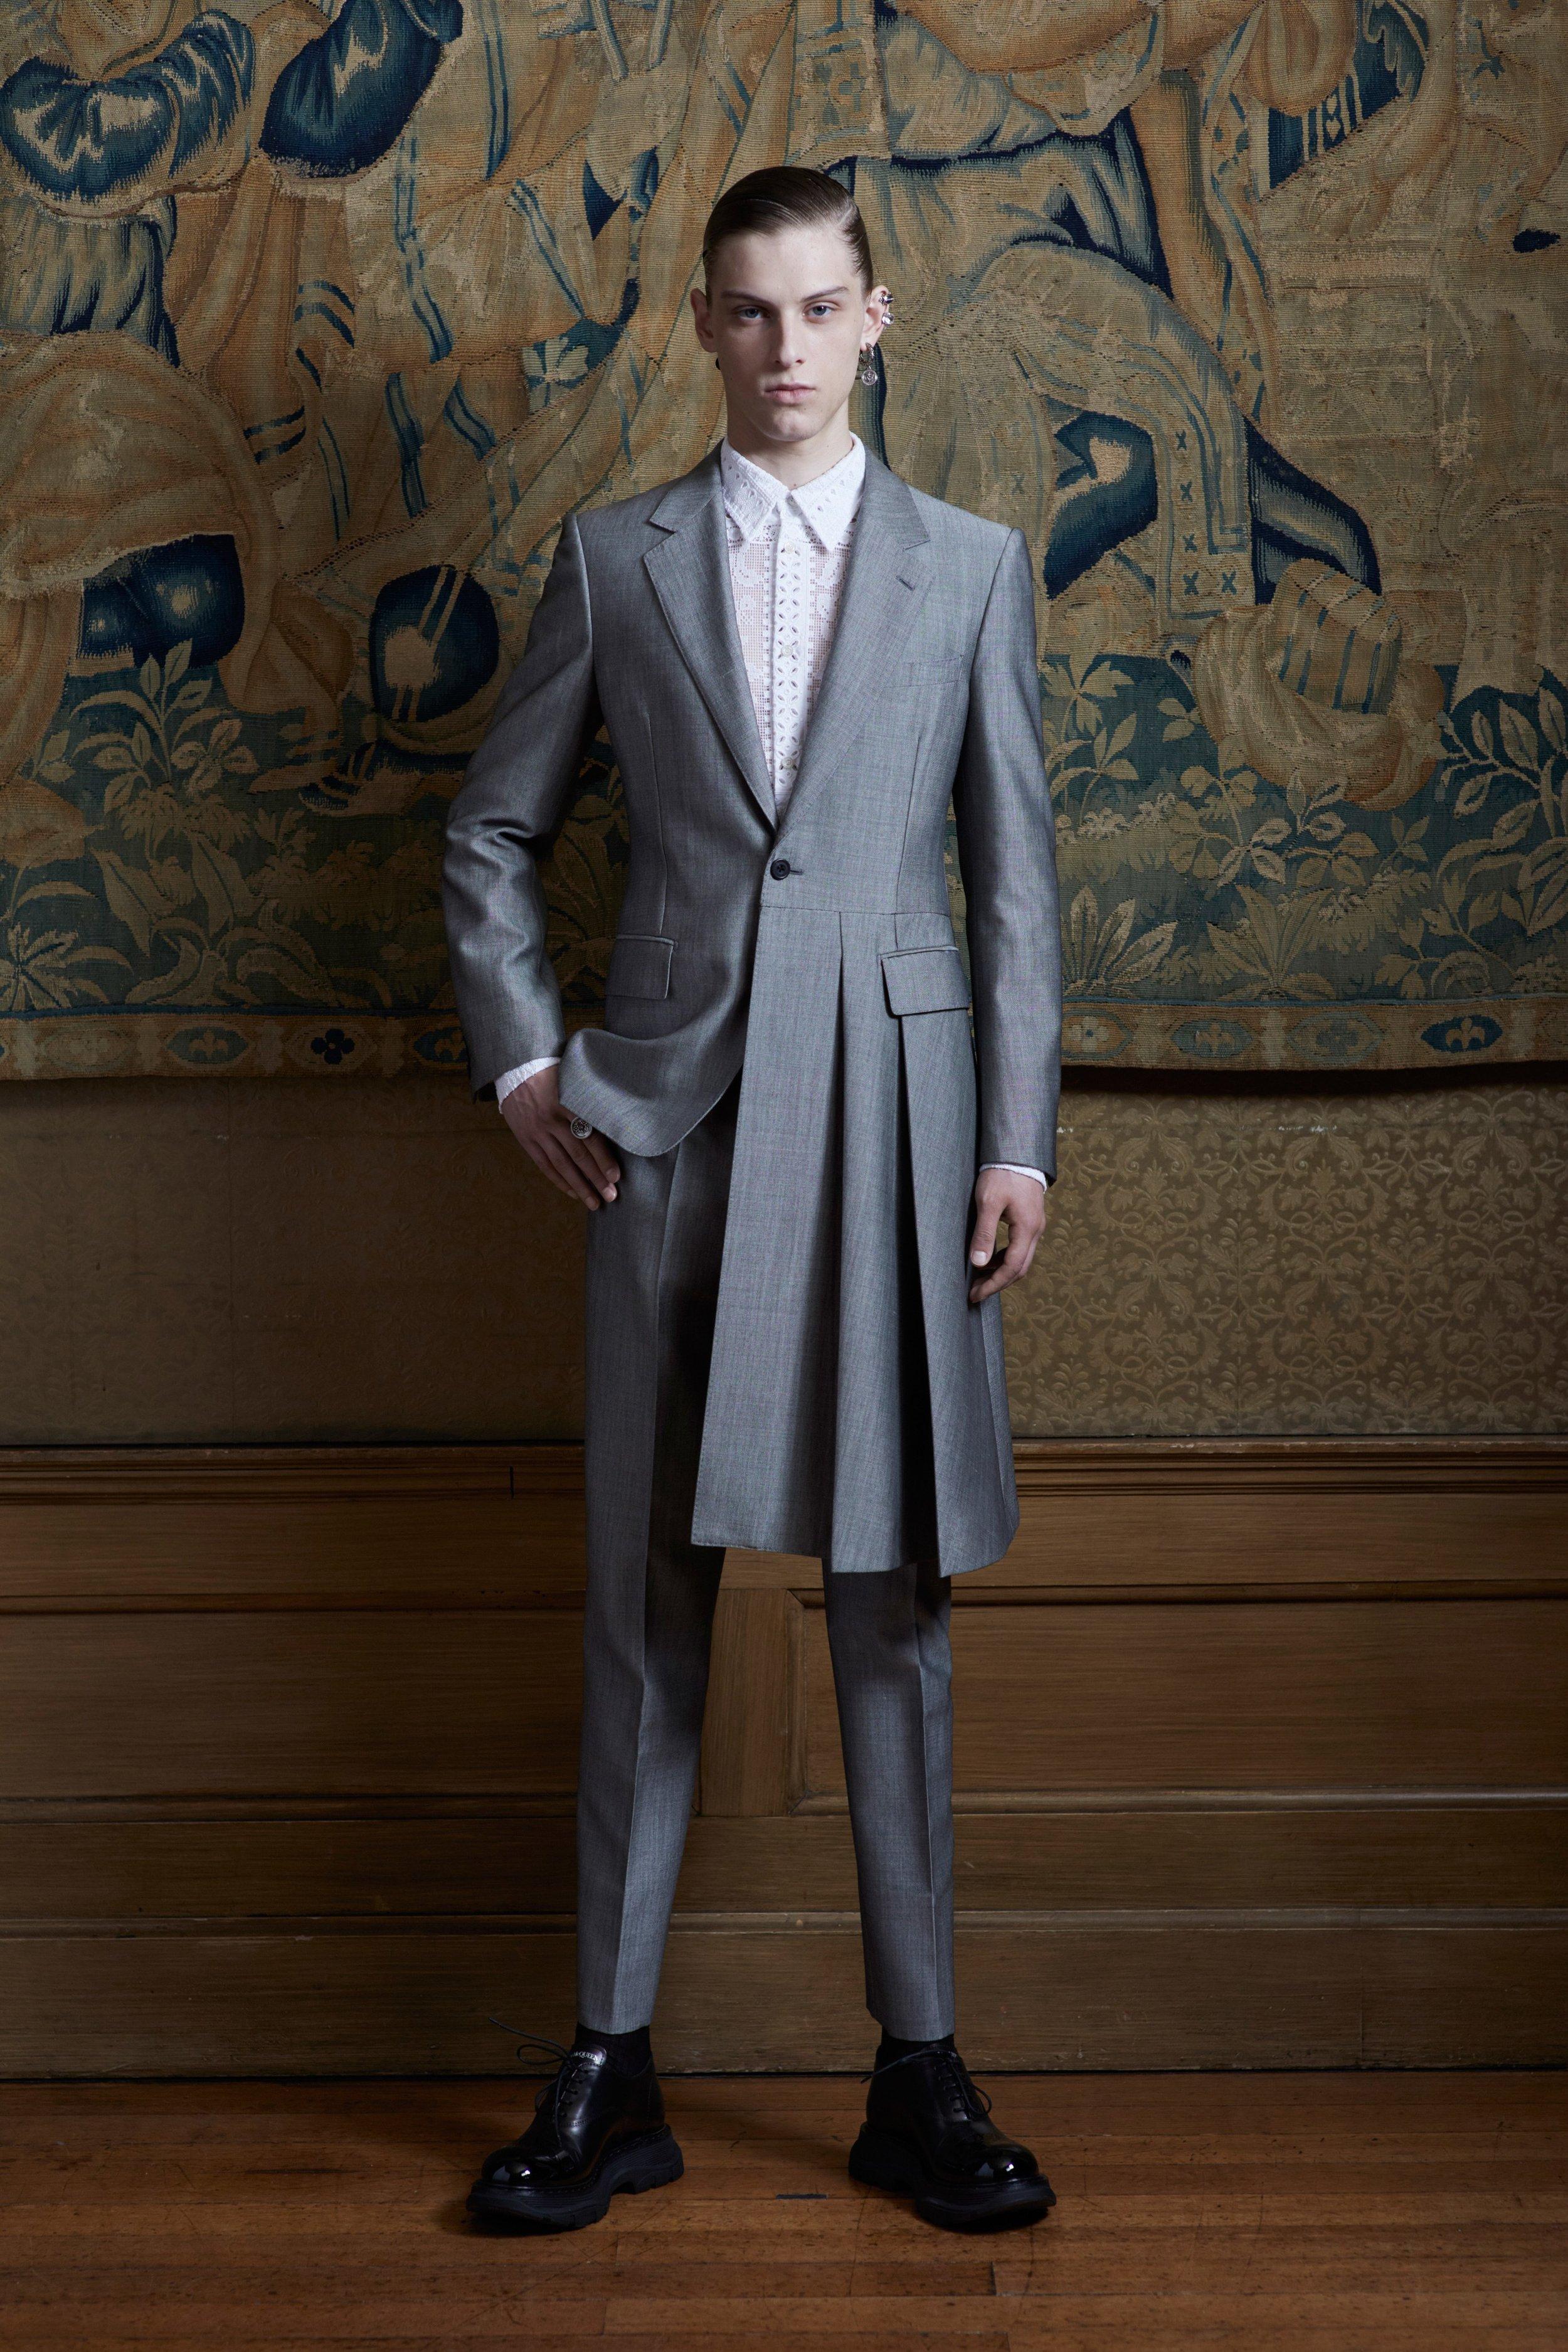 00003-alexander-mcqueen-menswear-spring-20-credit-Ethan-James-Green.jpg